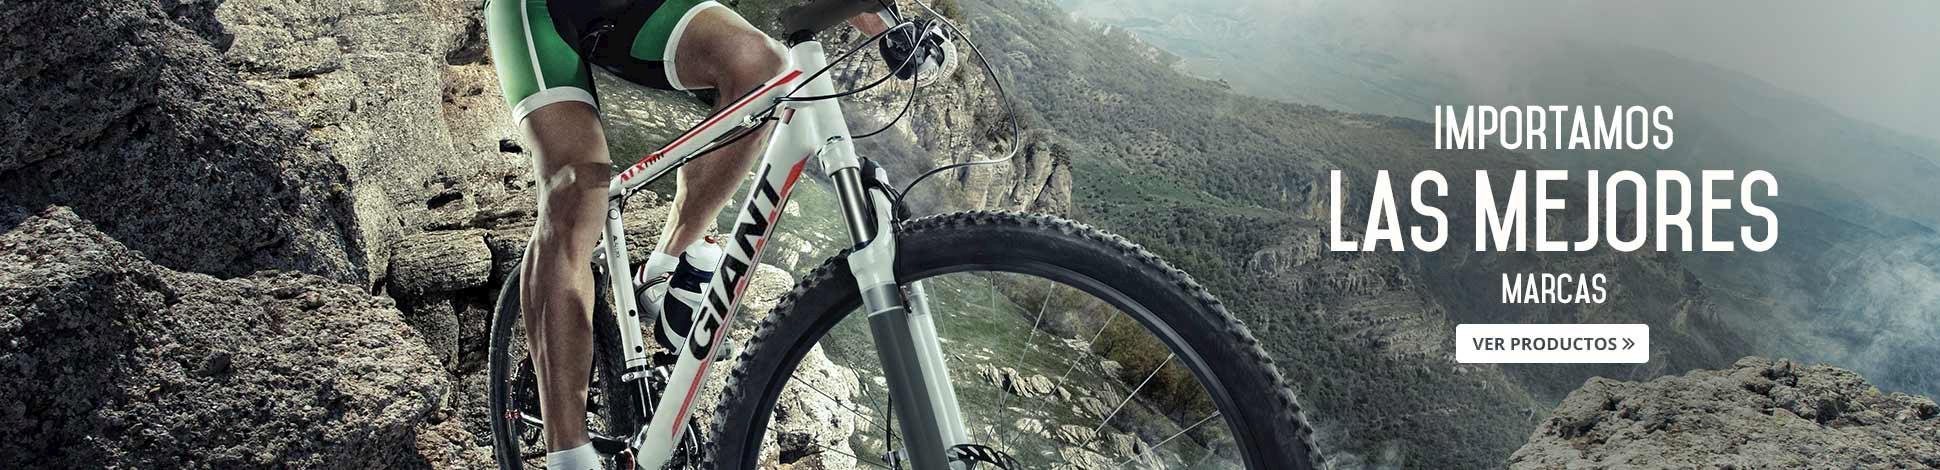 1940x470-hs-bicicletas-online.jpg